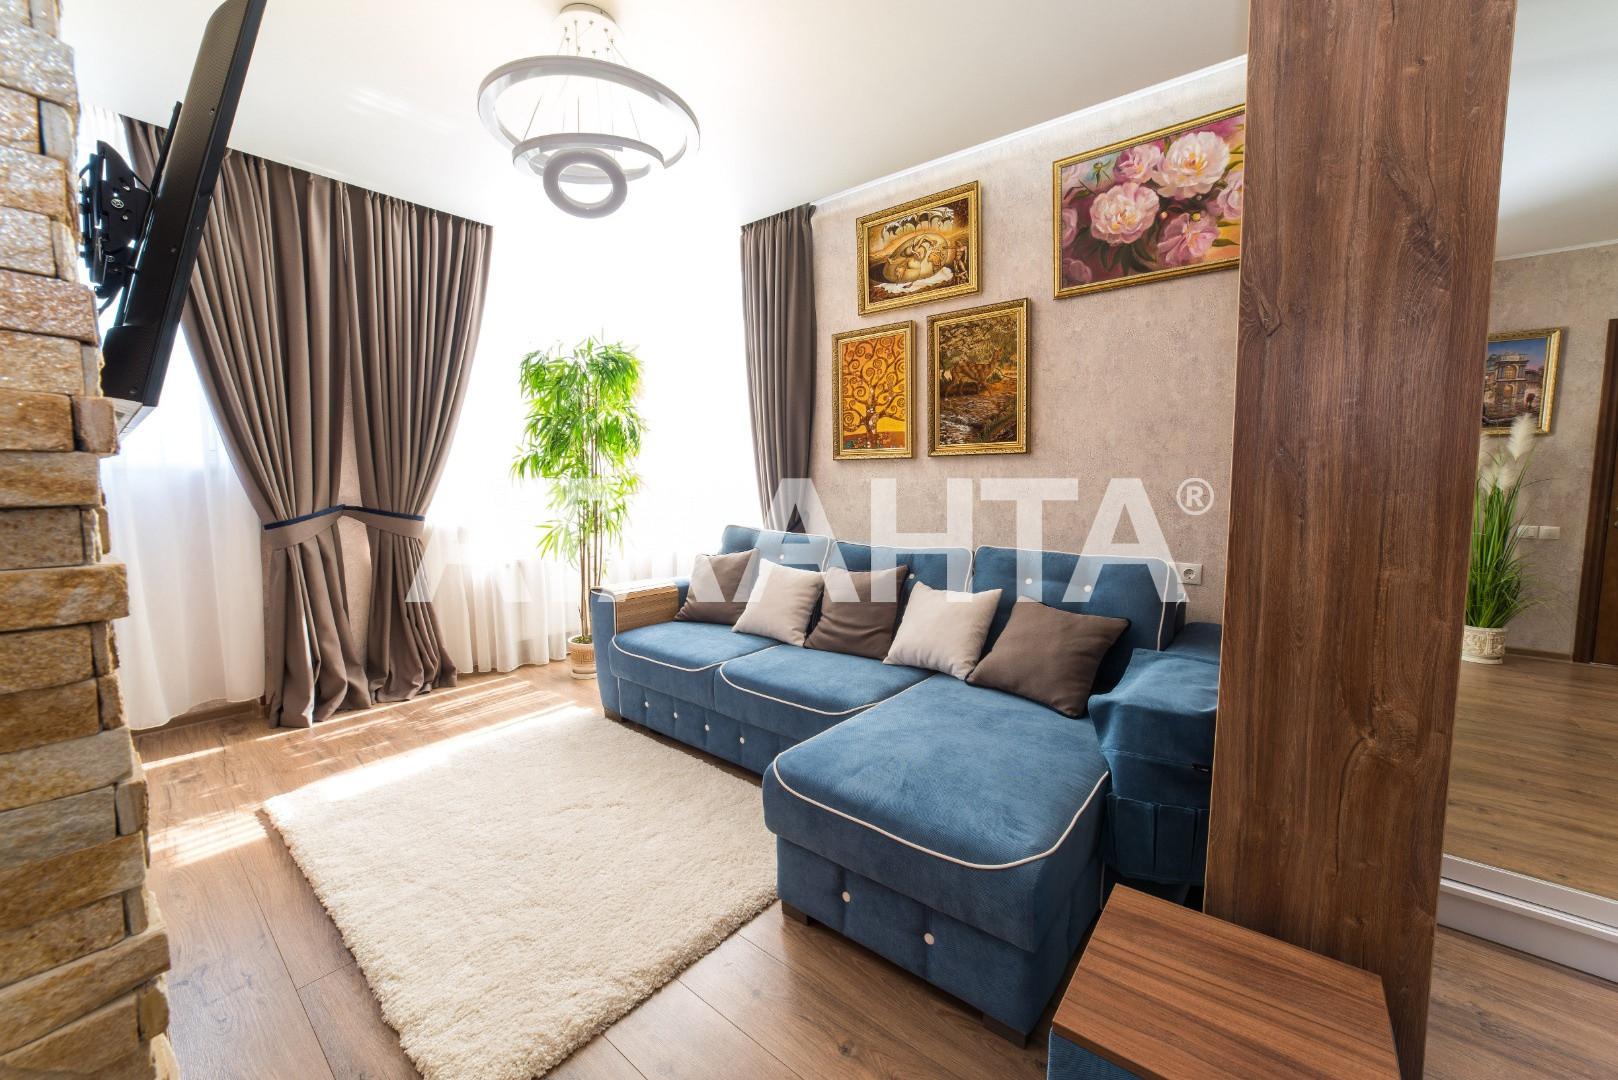 Продается 1-комнатная Квартира на ул. Балковская (Фрунзе) — 50 000 у.е. (фото №14)